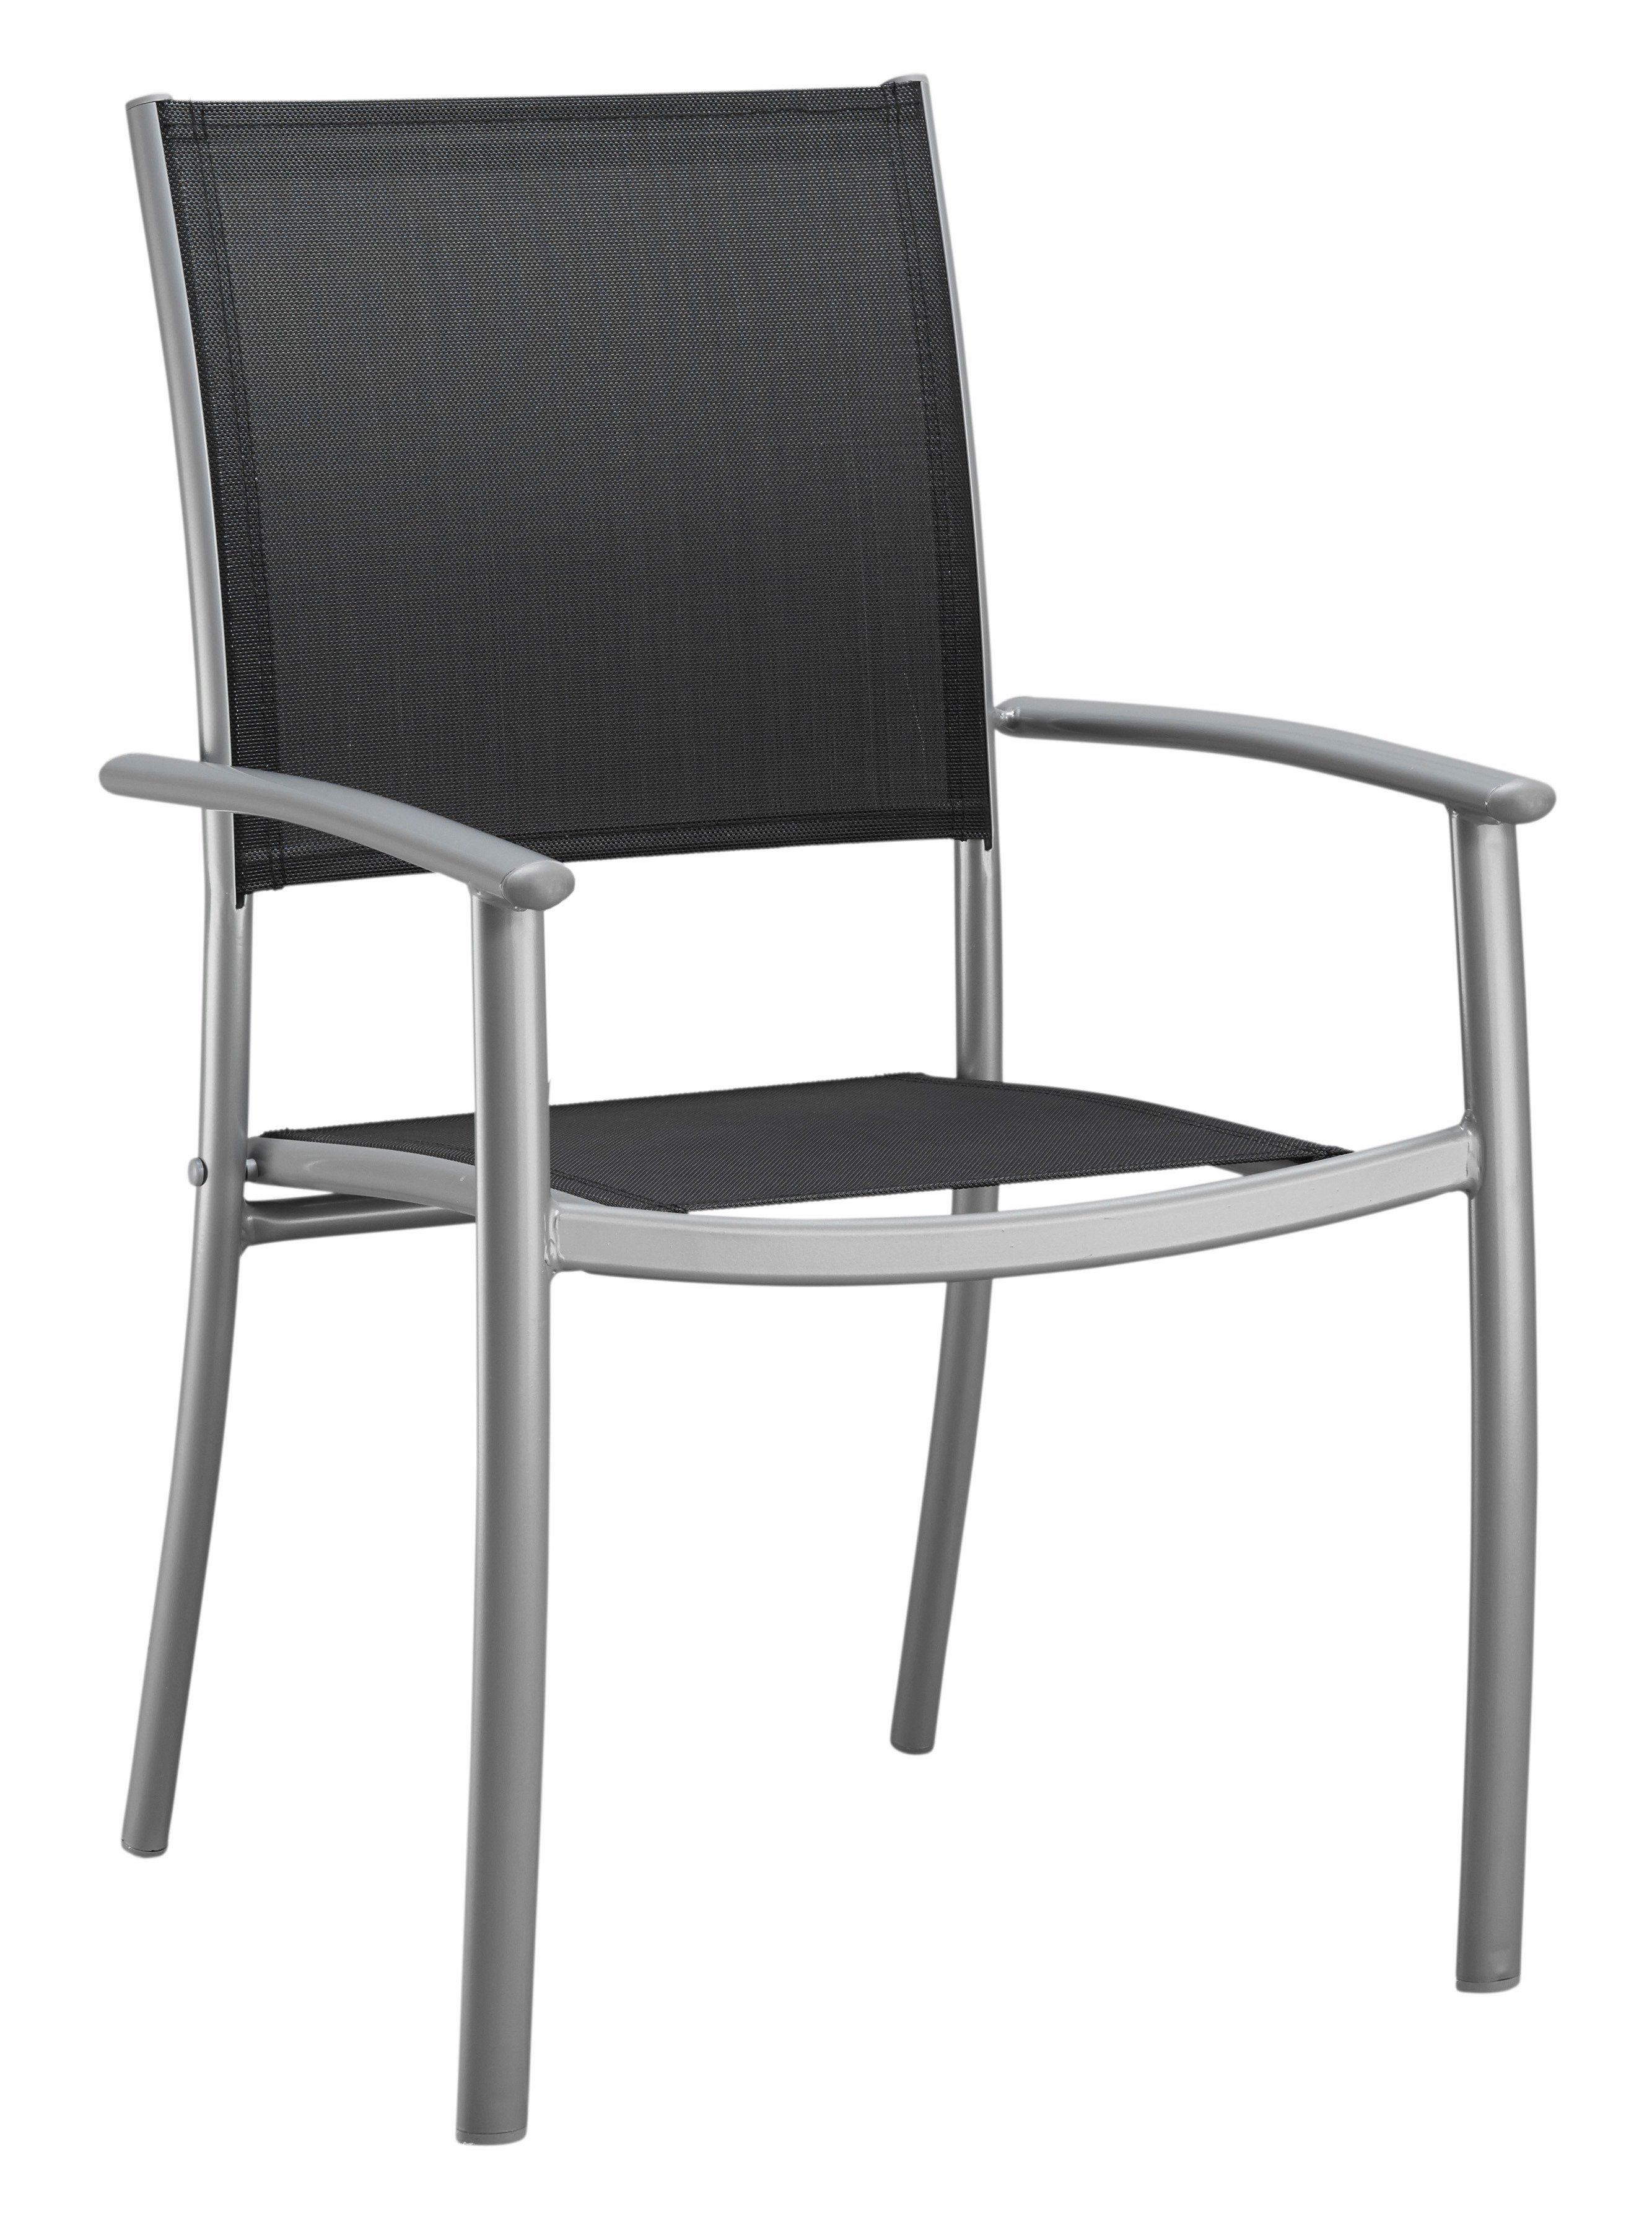 Gartenstuhl »Milano«, (2er Set), Alu/Textil, stapelbar, schwarz